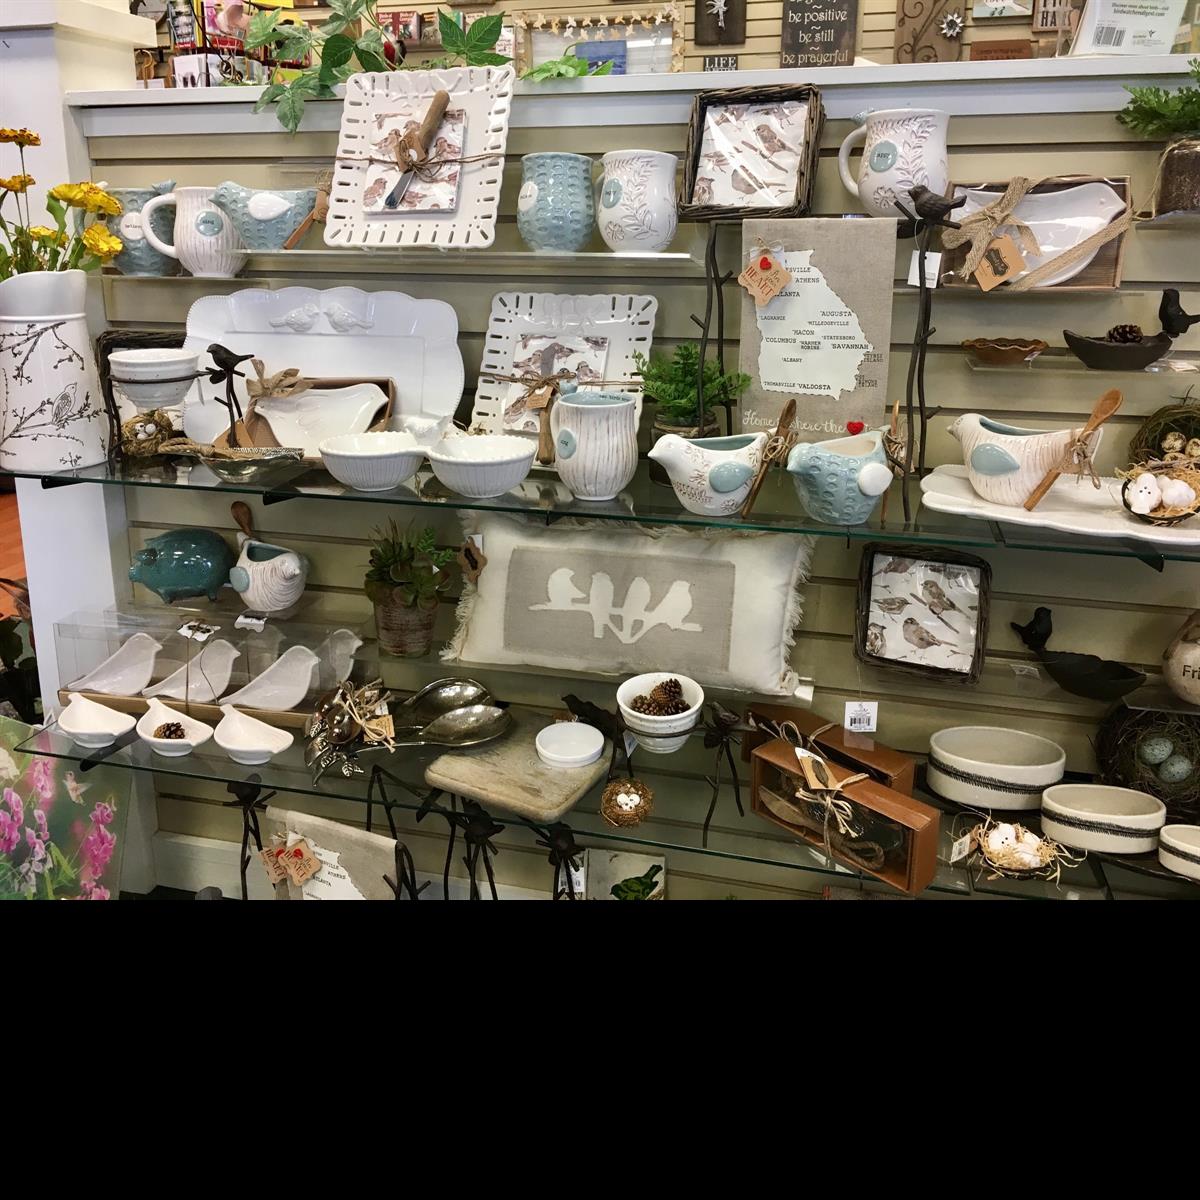 Mudpie, nest, kitchen, mugs, entertain, platter, dips, napkins, tea towel, serving pieces, bird